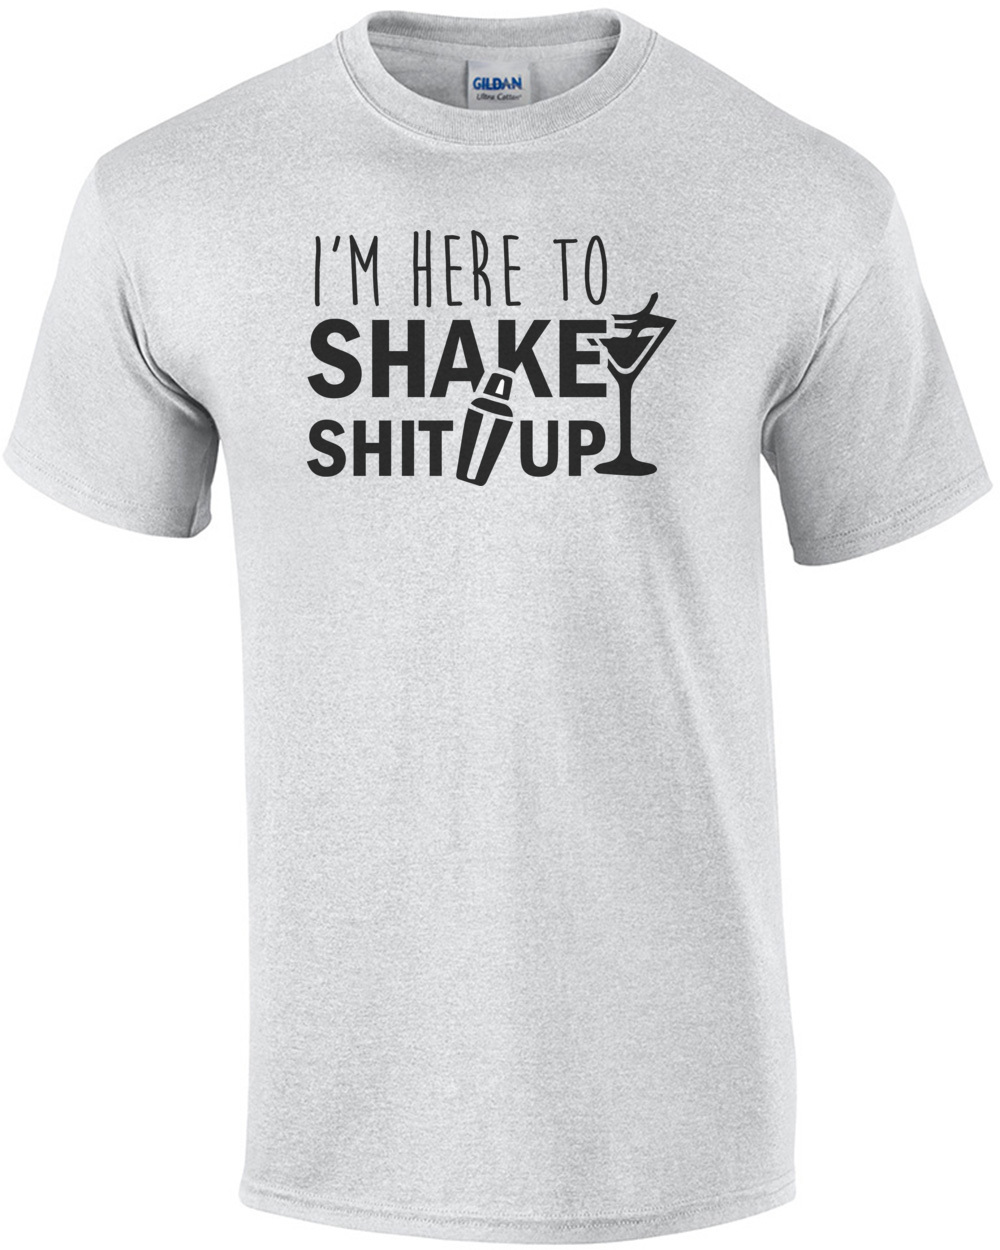 aa7bbcf24 im-here-to-shake-shit-up--funny-bartending--bartender-tshirt -mens-regular-ash.jpg